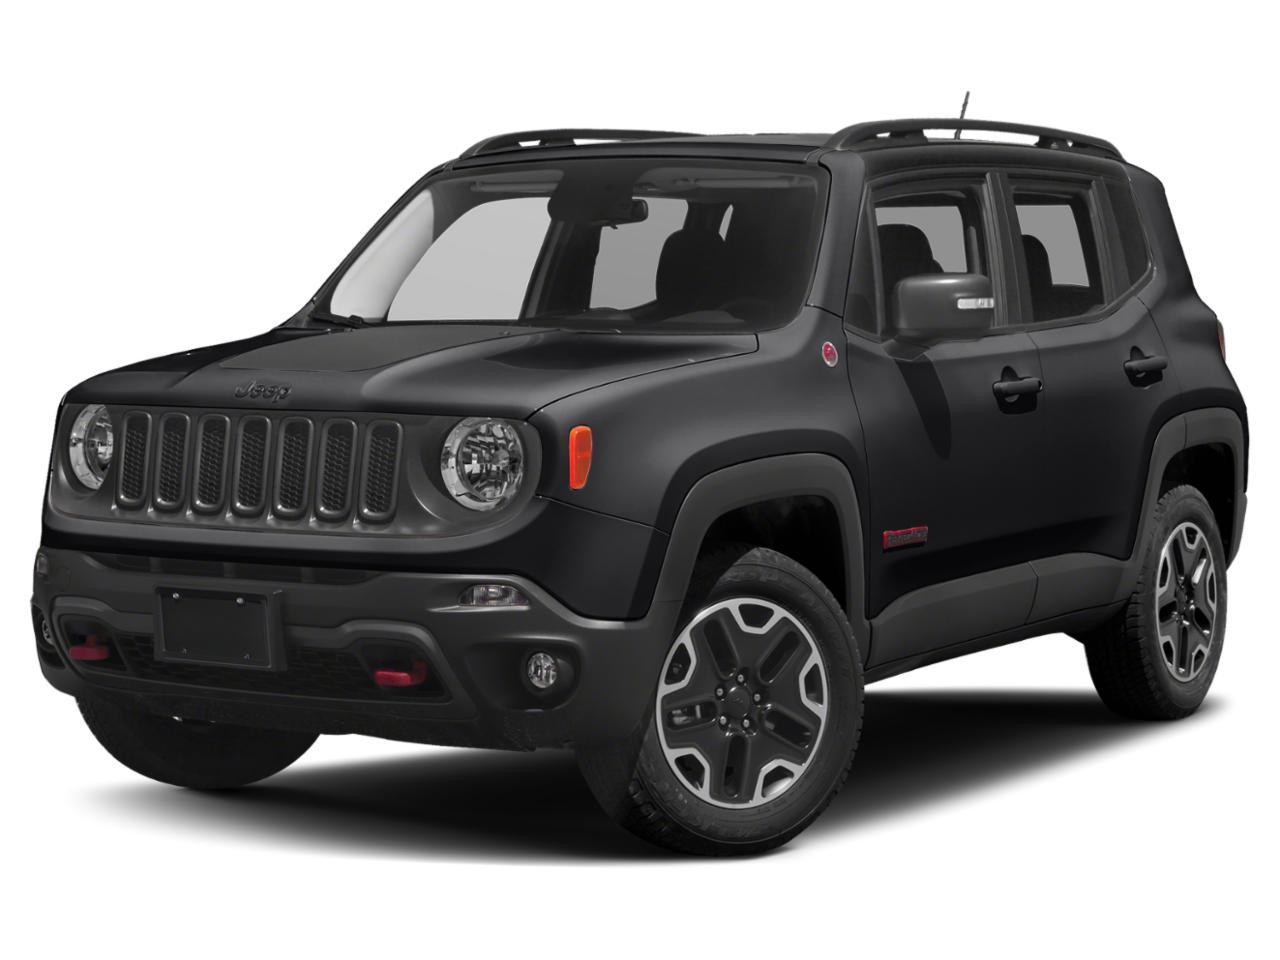 2018 Jeep Renegade Vehicle Photo in Raton, NM 87740